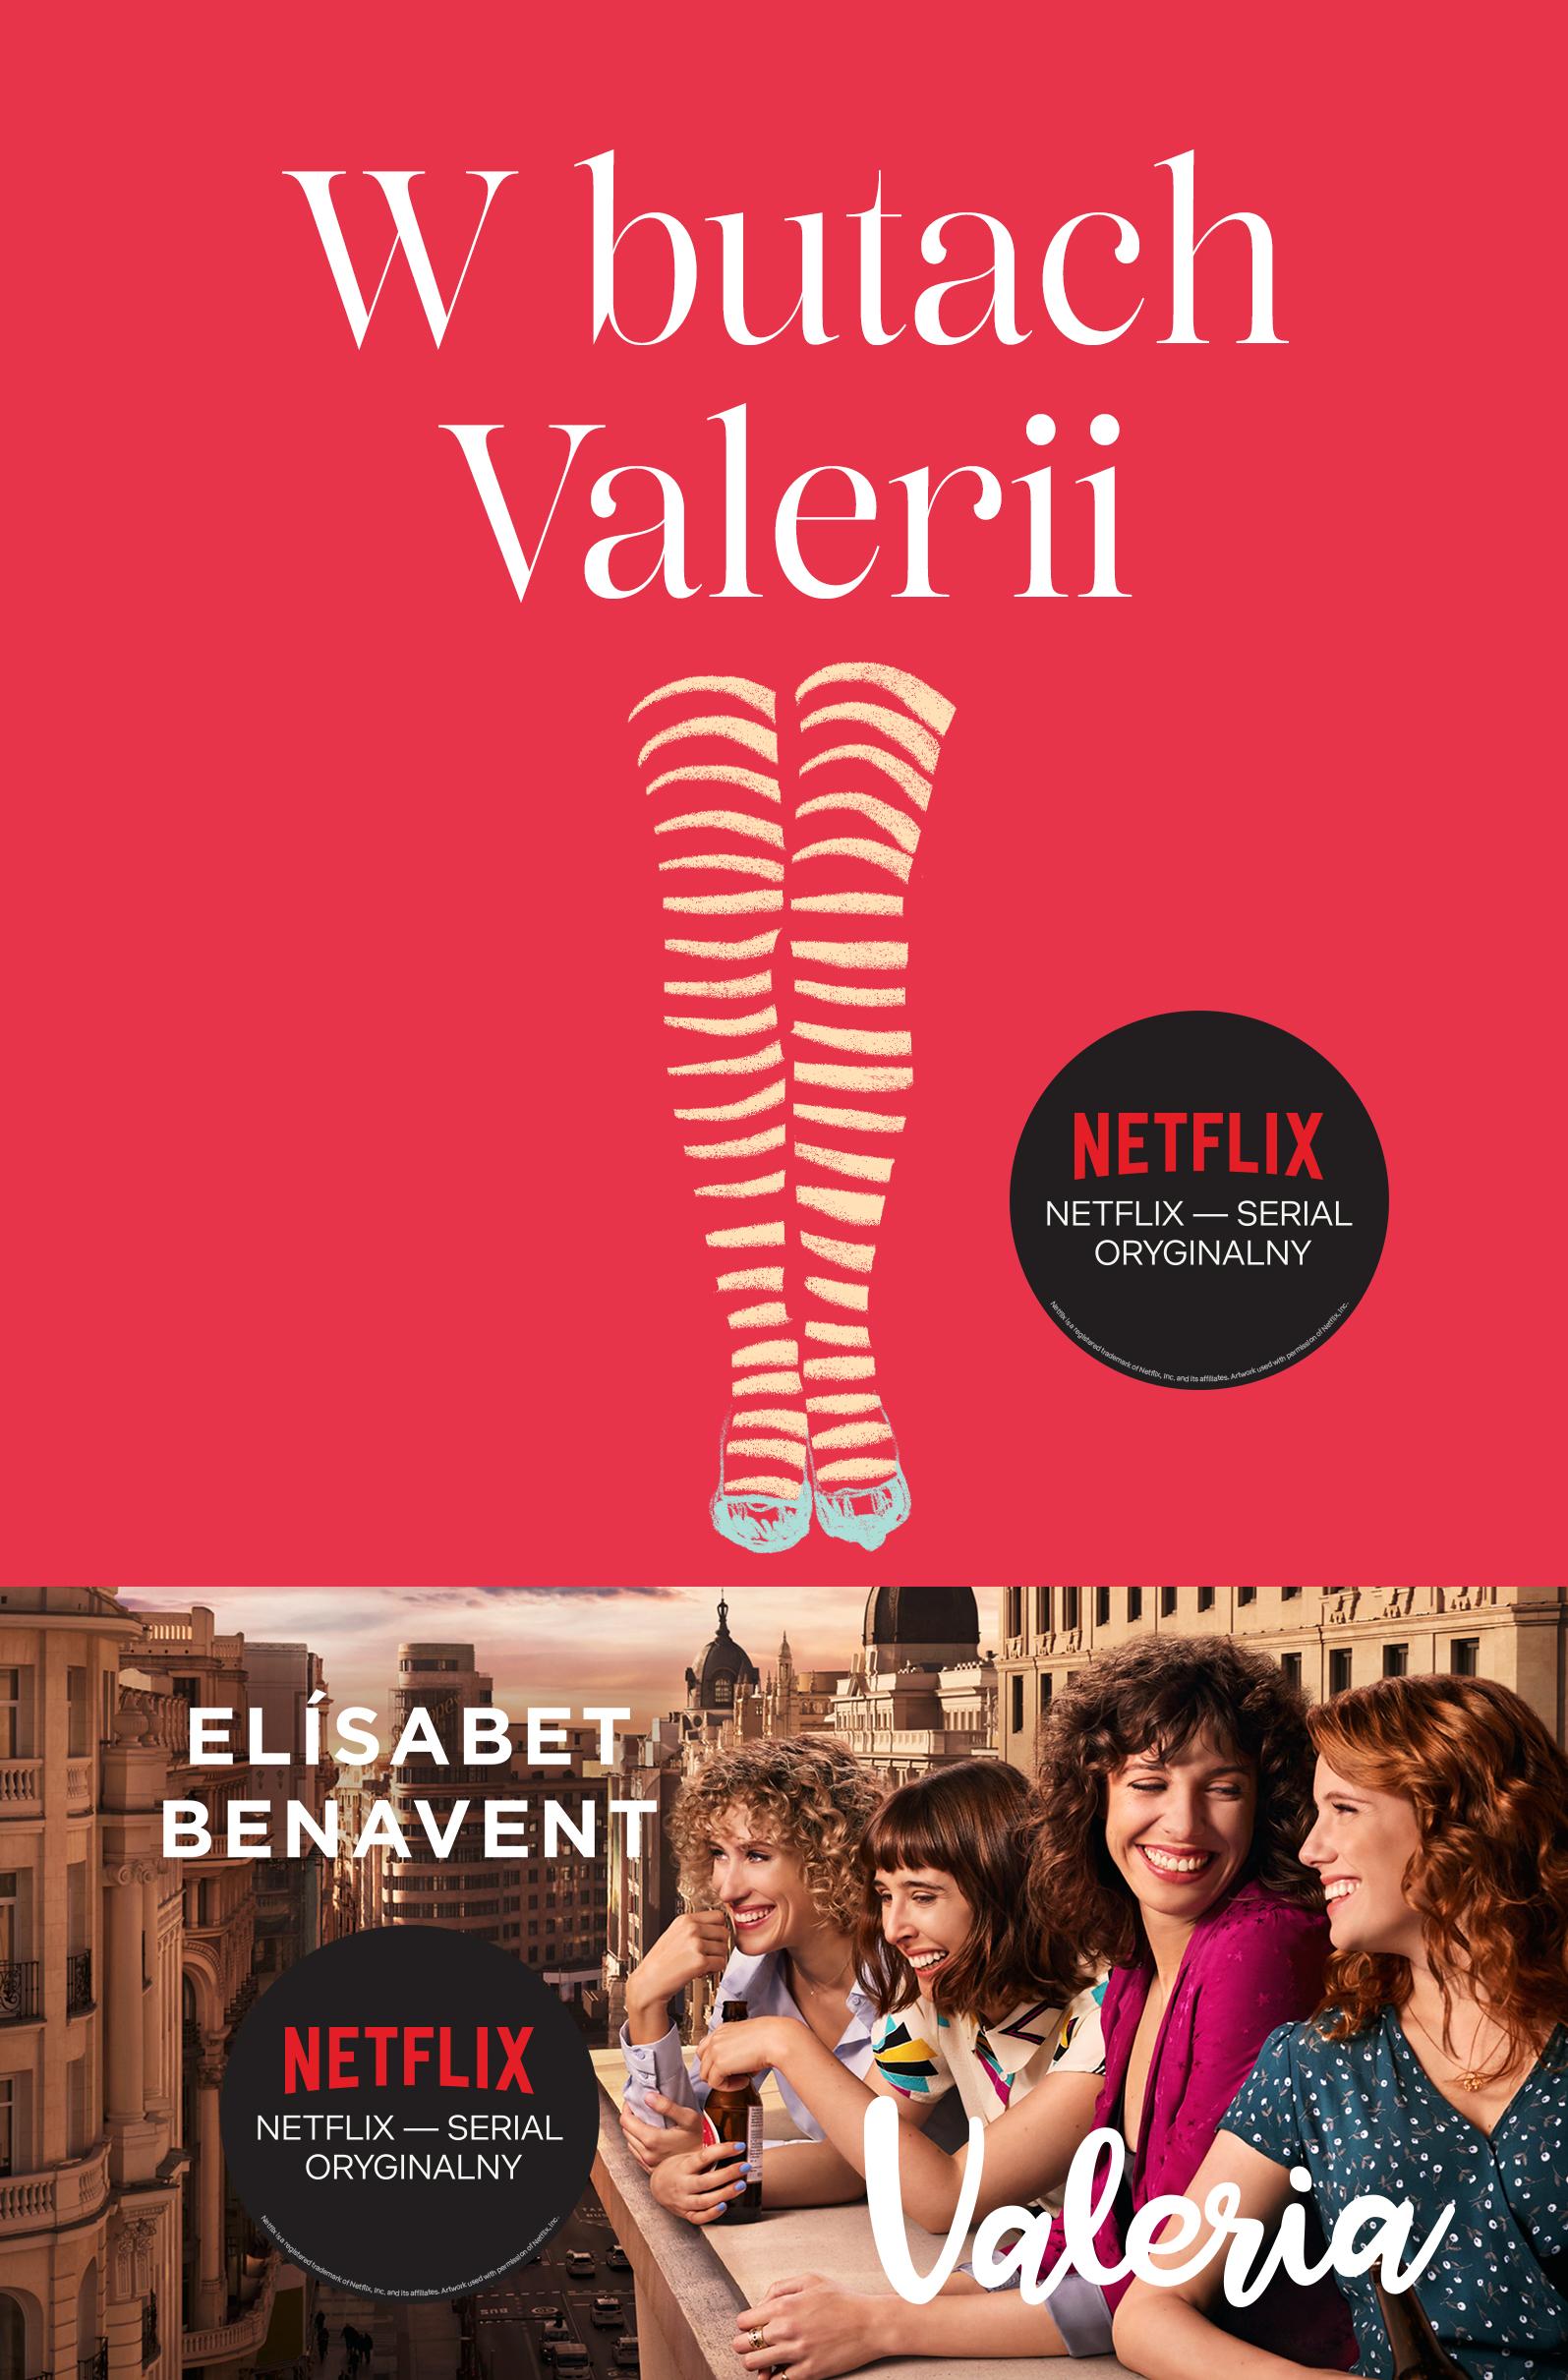 W butach Valerii. Valeria. Tom 1